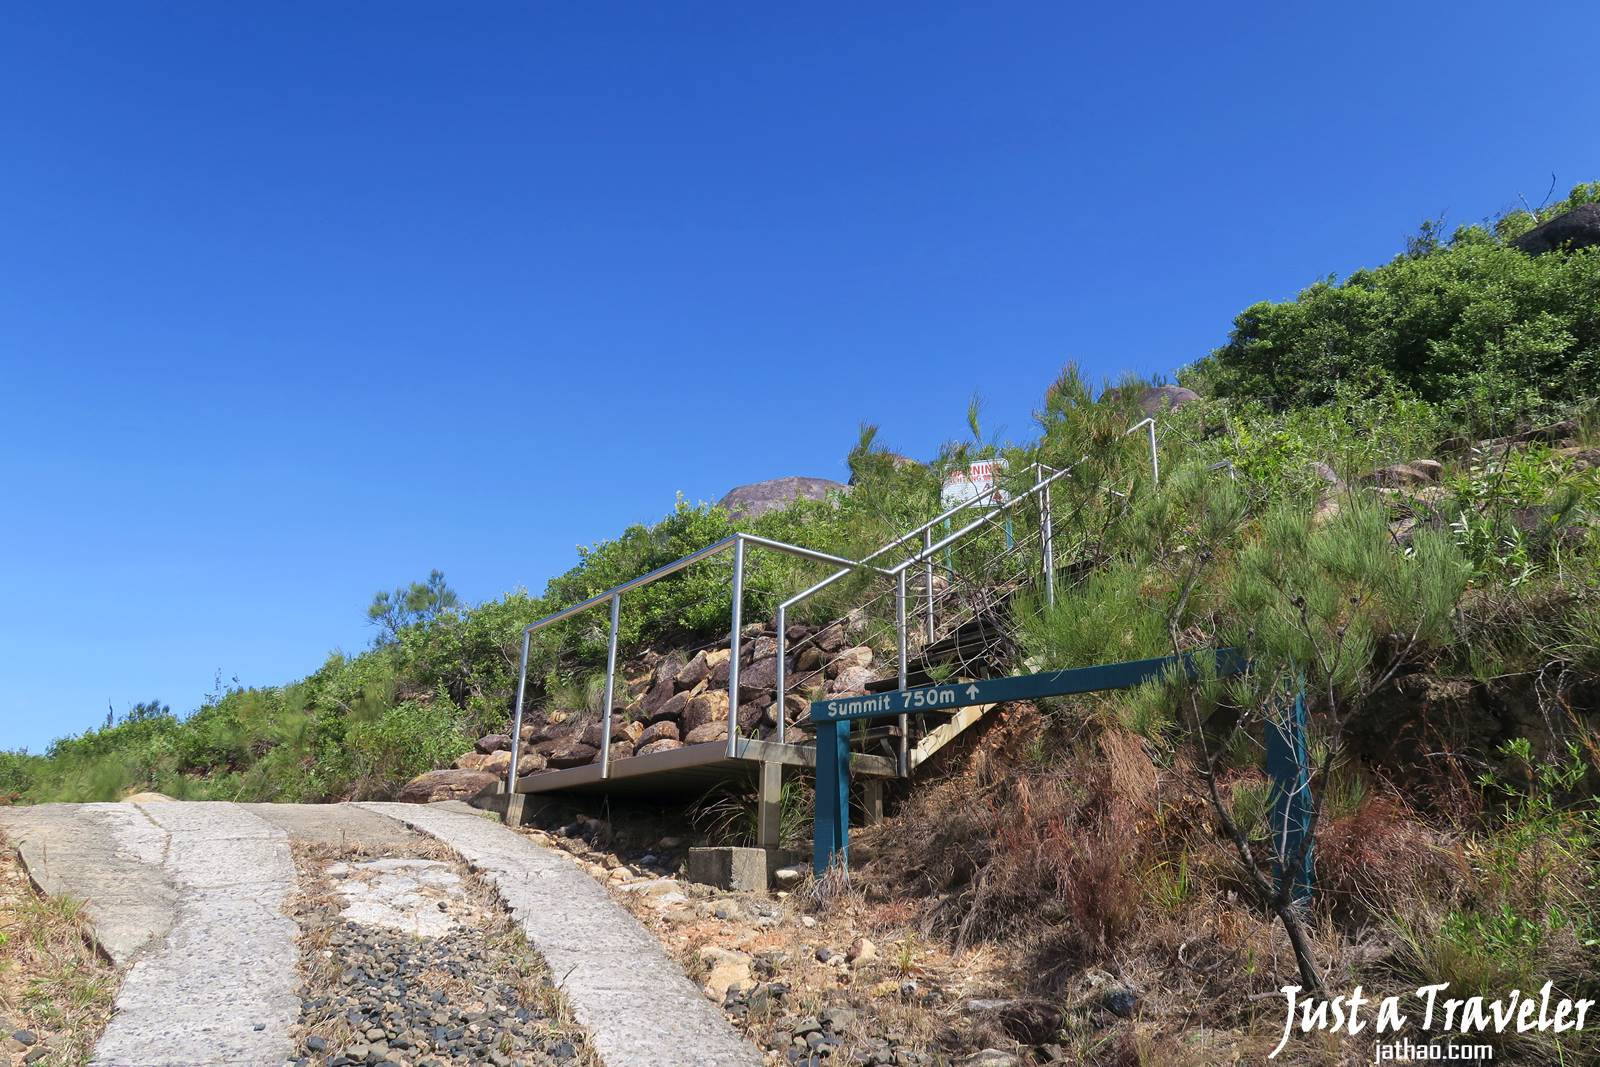 凱恩斯-大堡礁-翡翠島-登山-內堡礁-景點-推薦-旅遊-自由行-澳洲-Carins-Great-Barrier-Reef-Fitzroy-Island-hiking-mountain-Travel-Australia